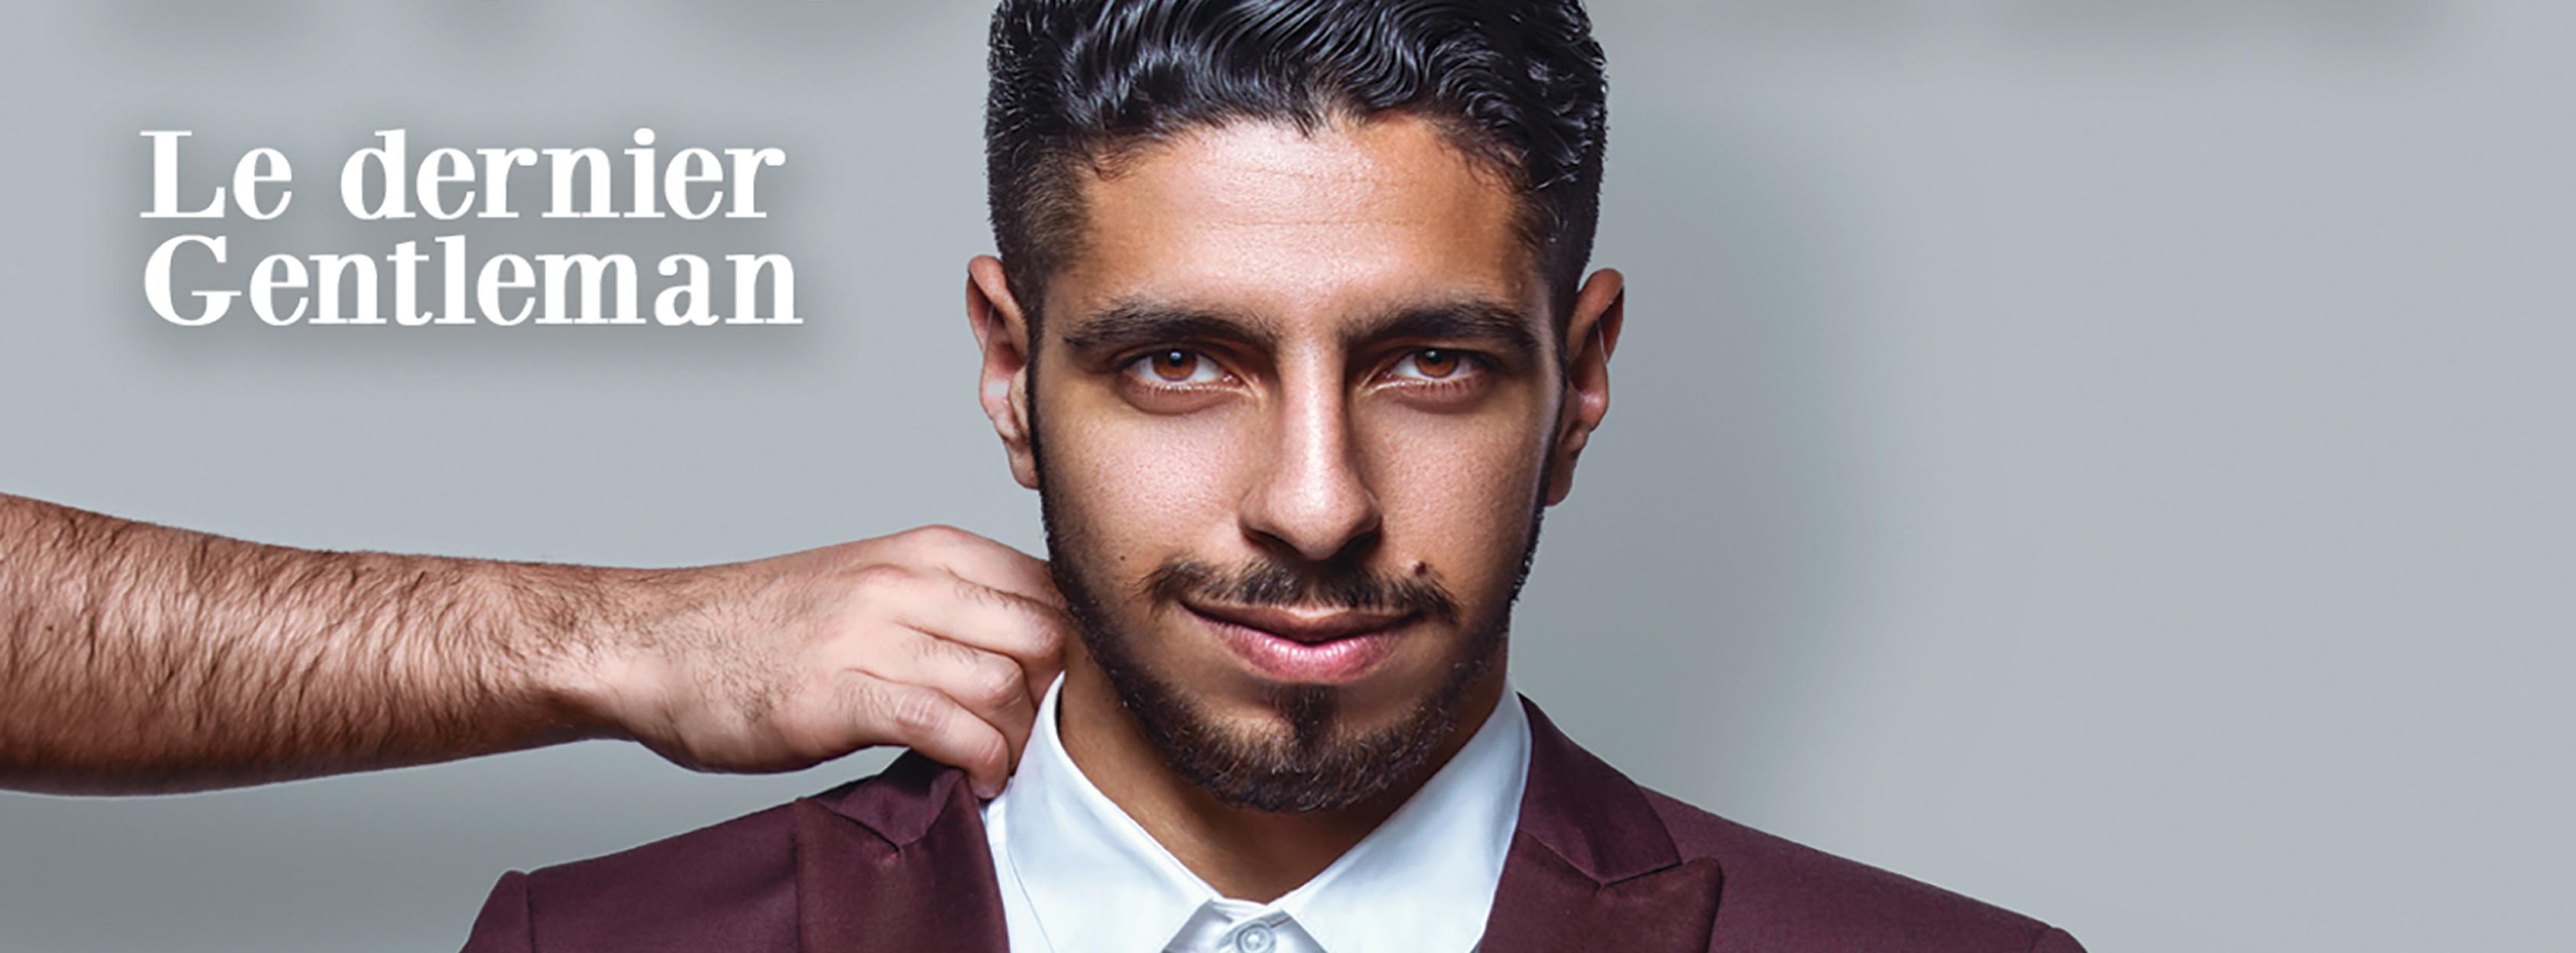 Mohamed Nouar le dernier gentleman